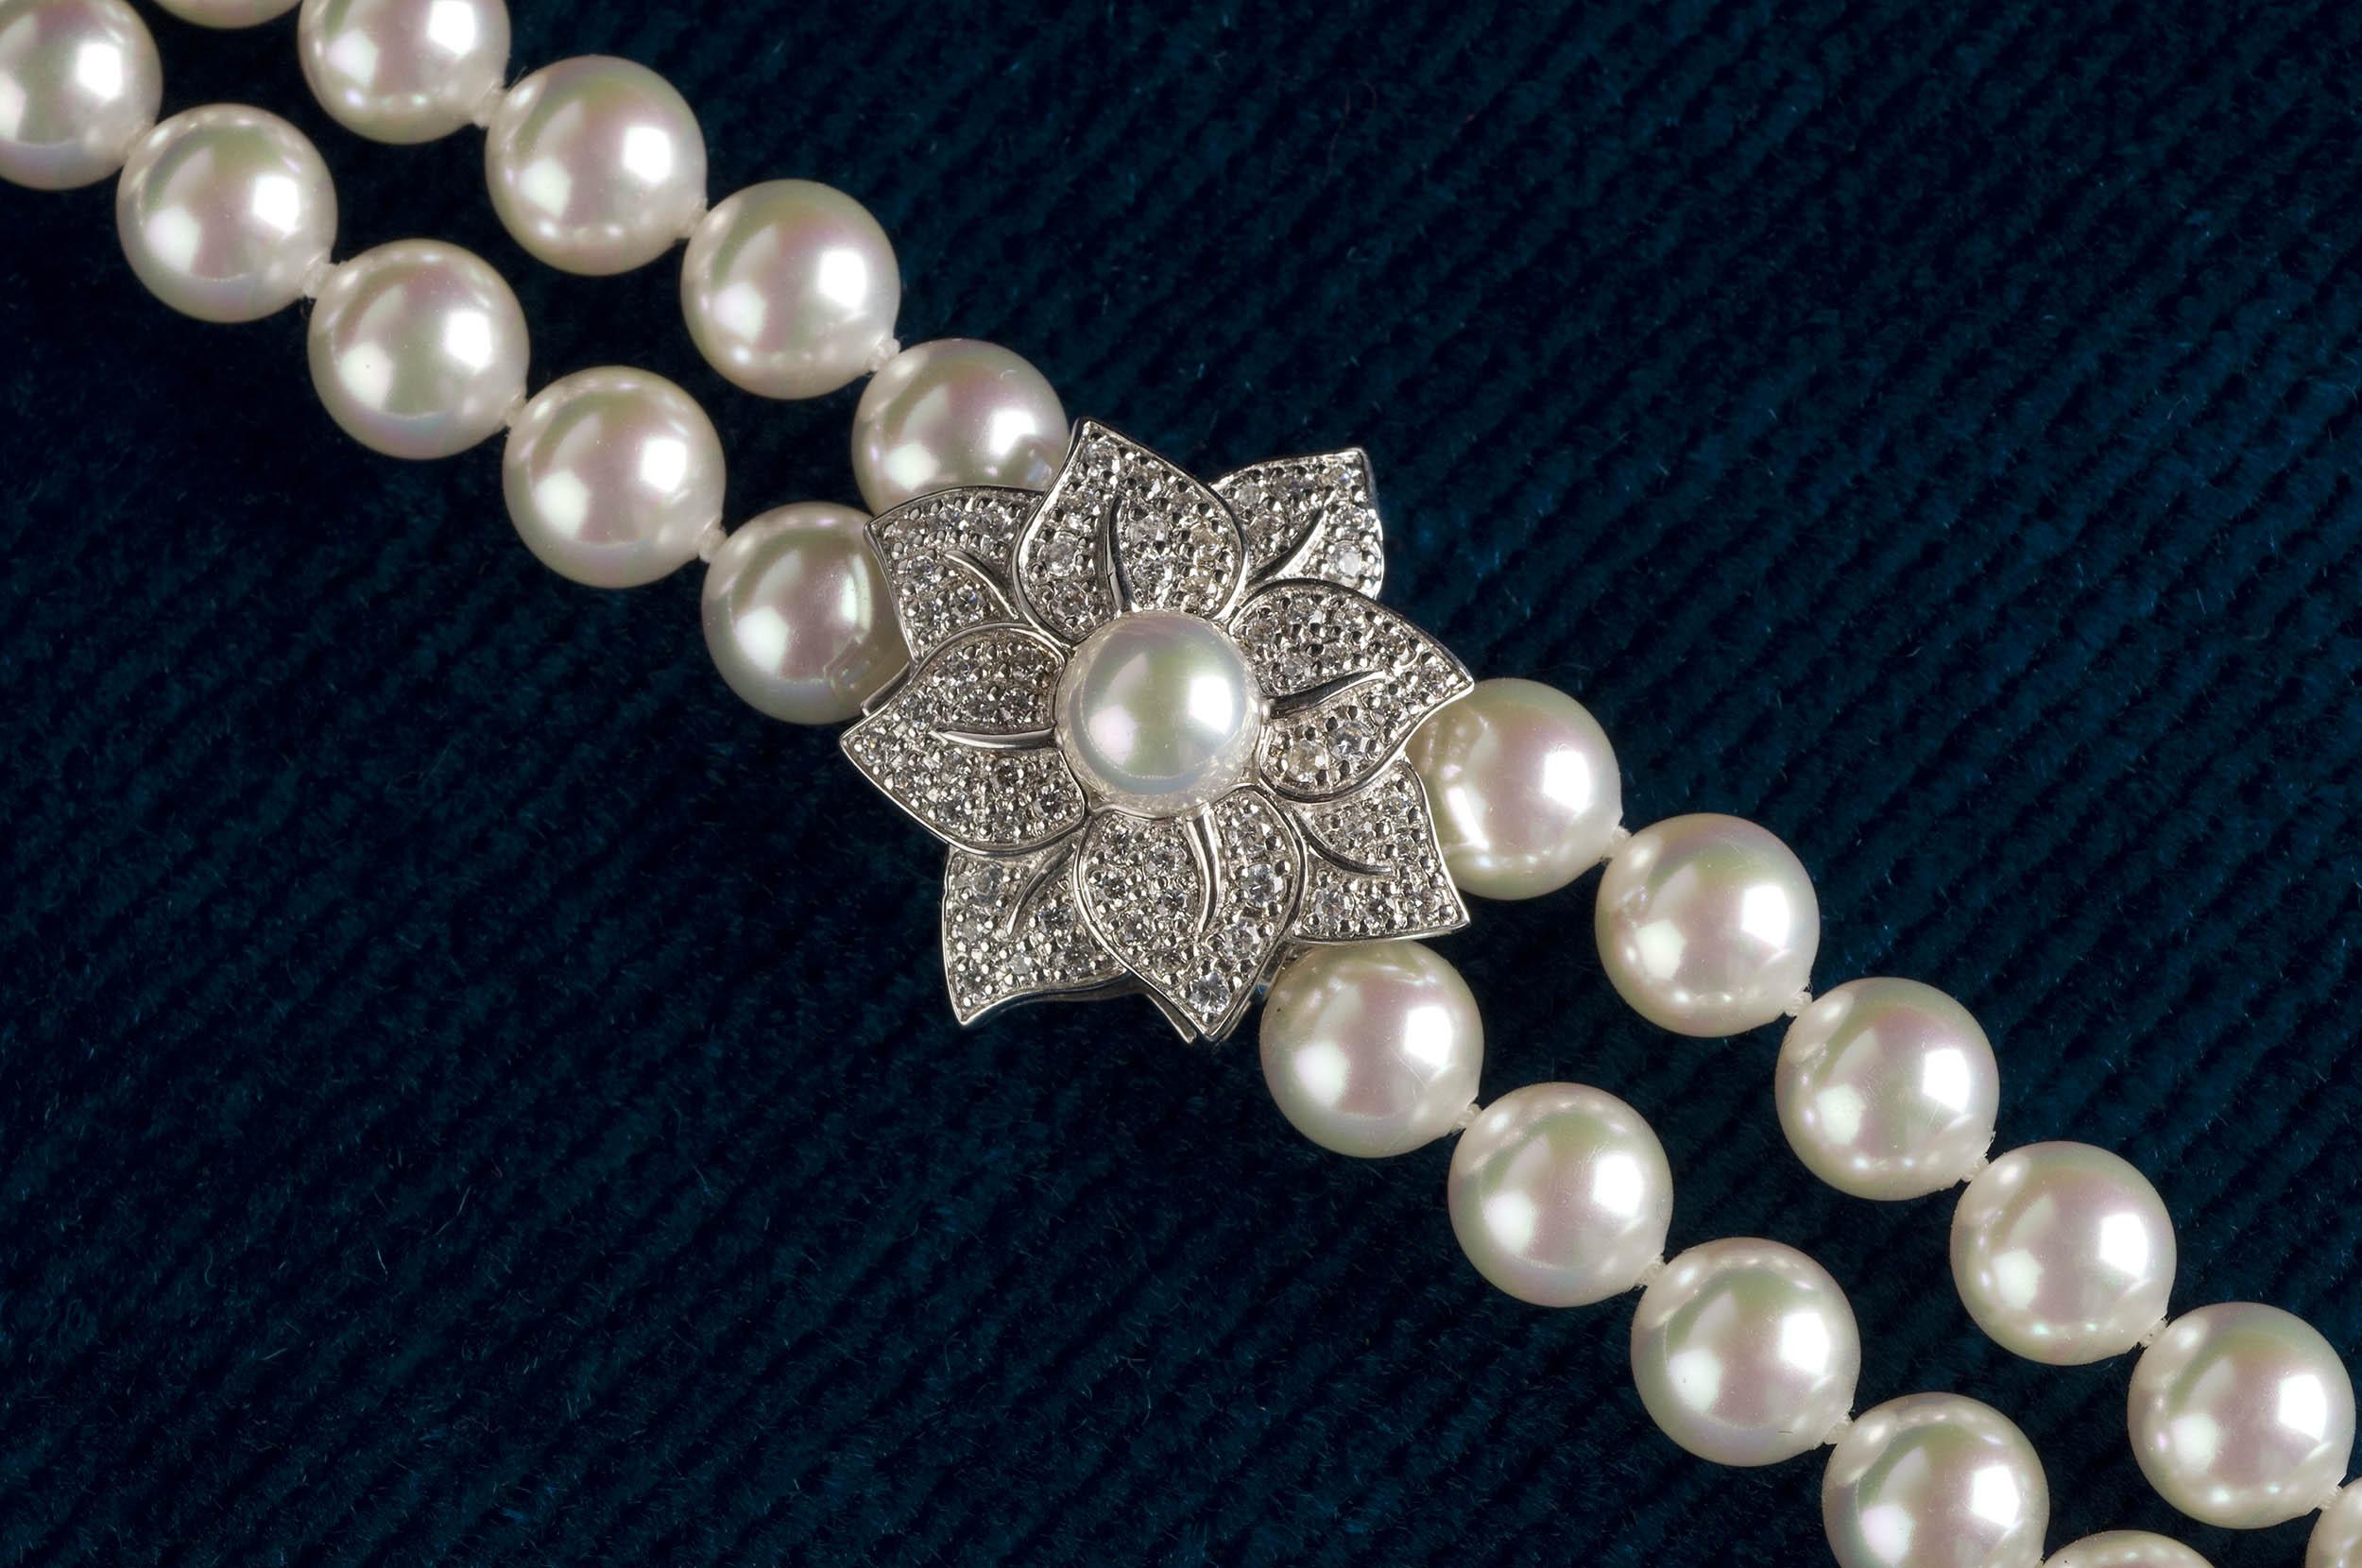 Perles a Manacor